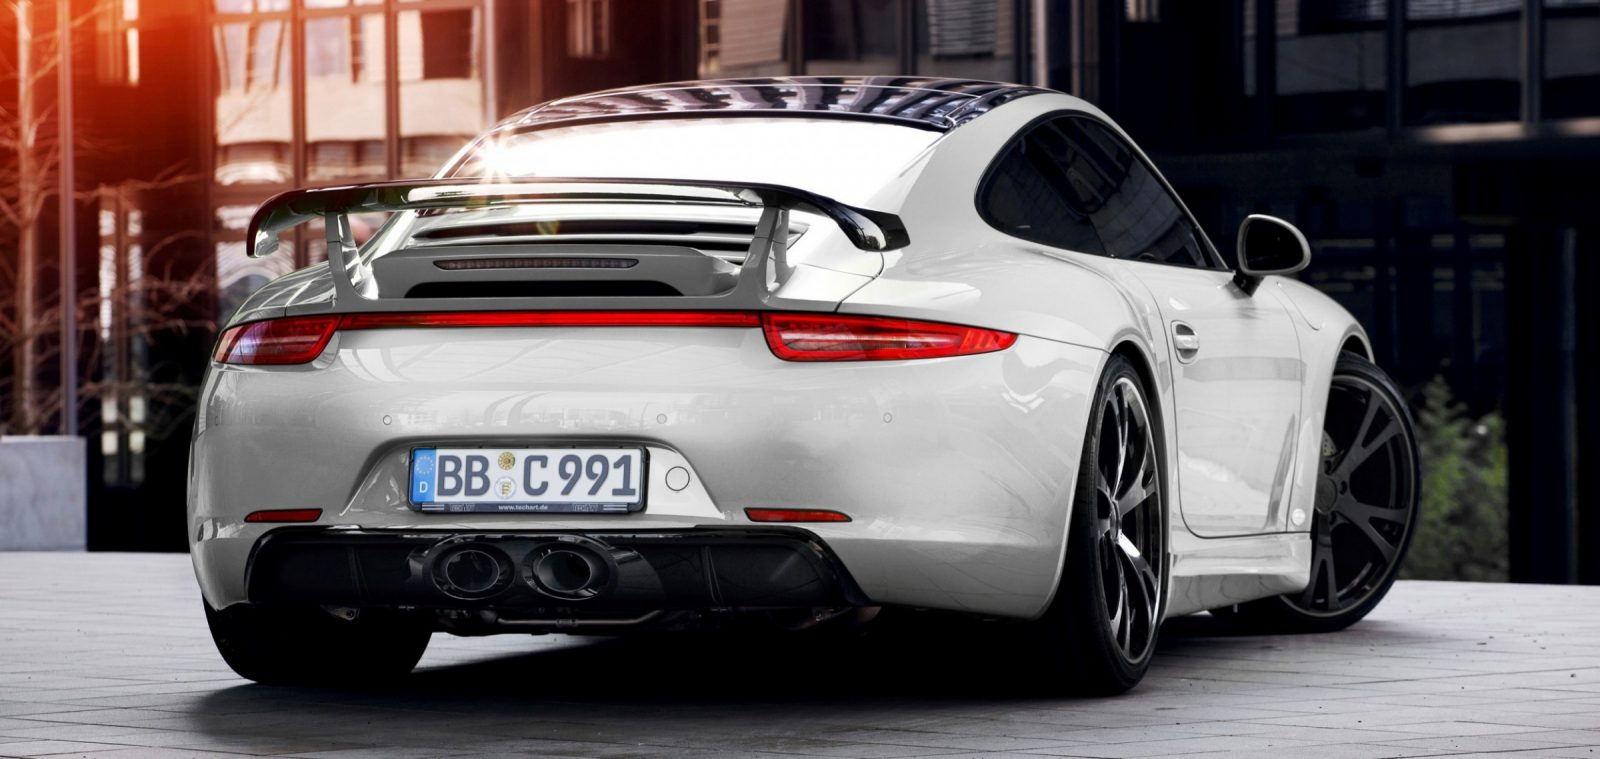 TECHART_for_Porsche_911_C4S_exterior4